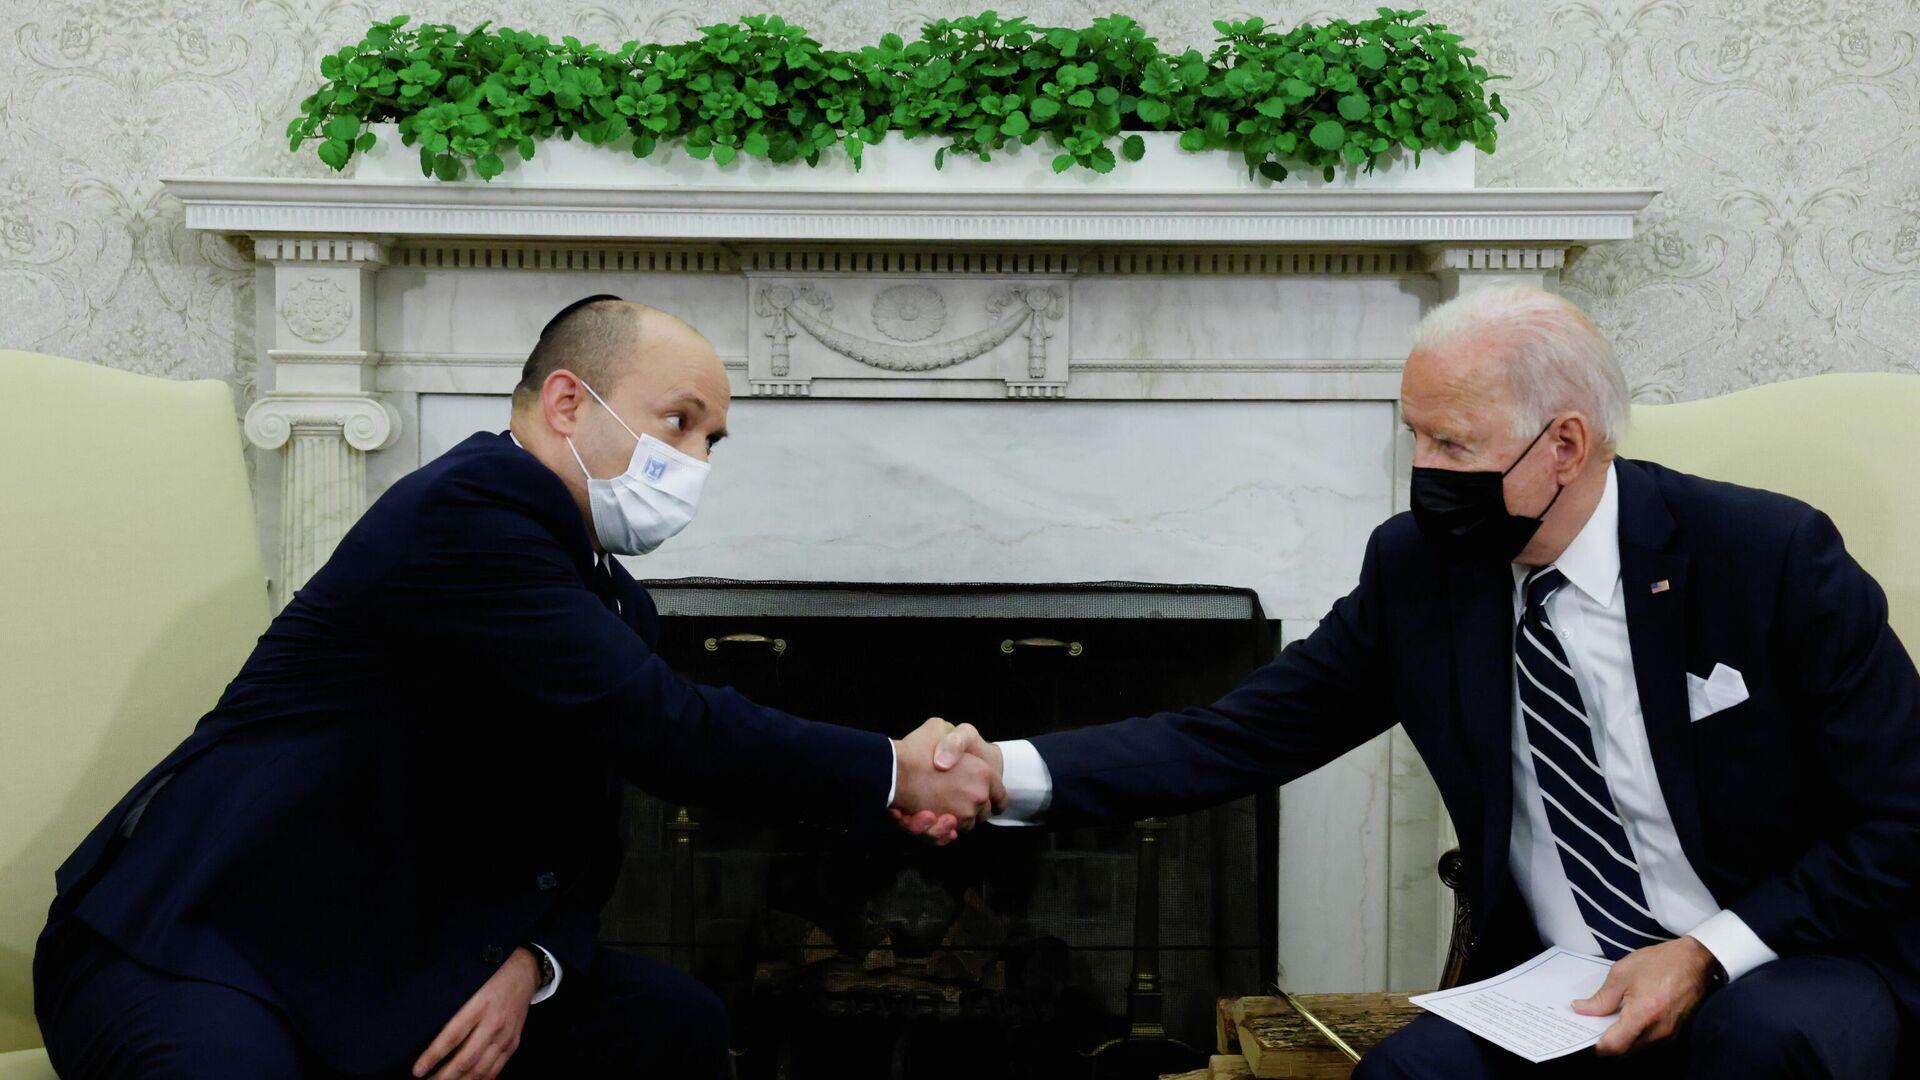 El primer ministro israelí, Naftali Bennett, y el presidente de EEUU, Joe Biden - Sputnik Mundo, 1920, 29.08.2021